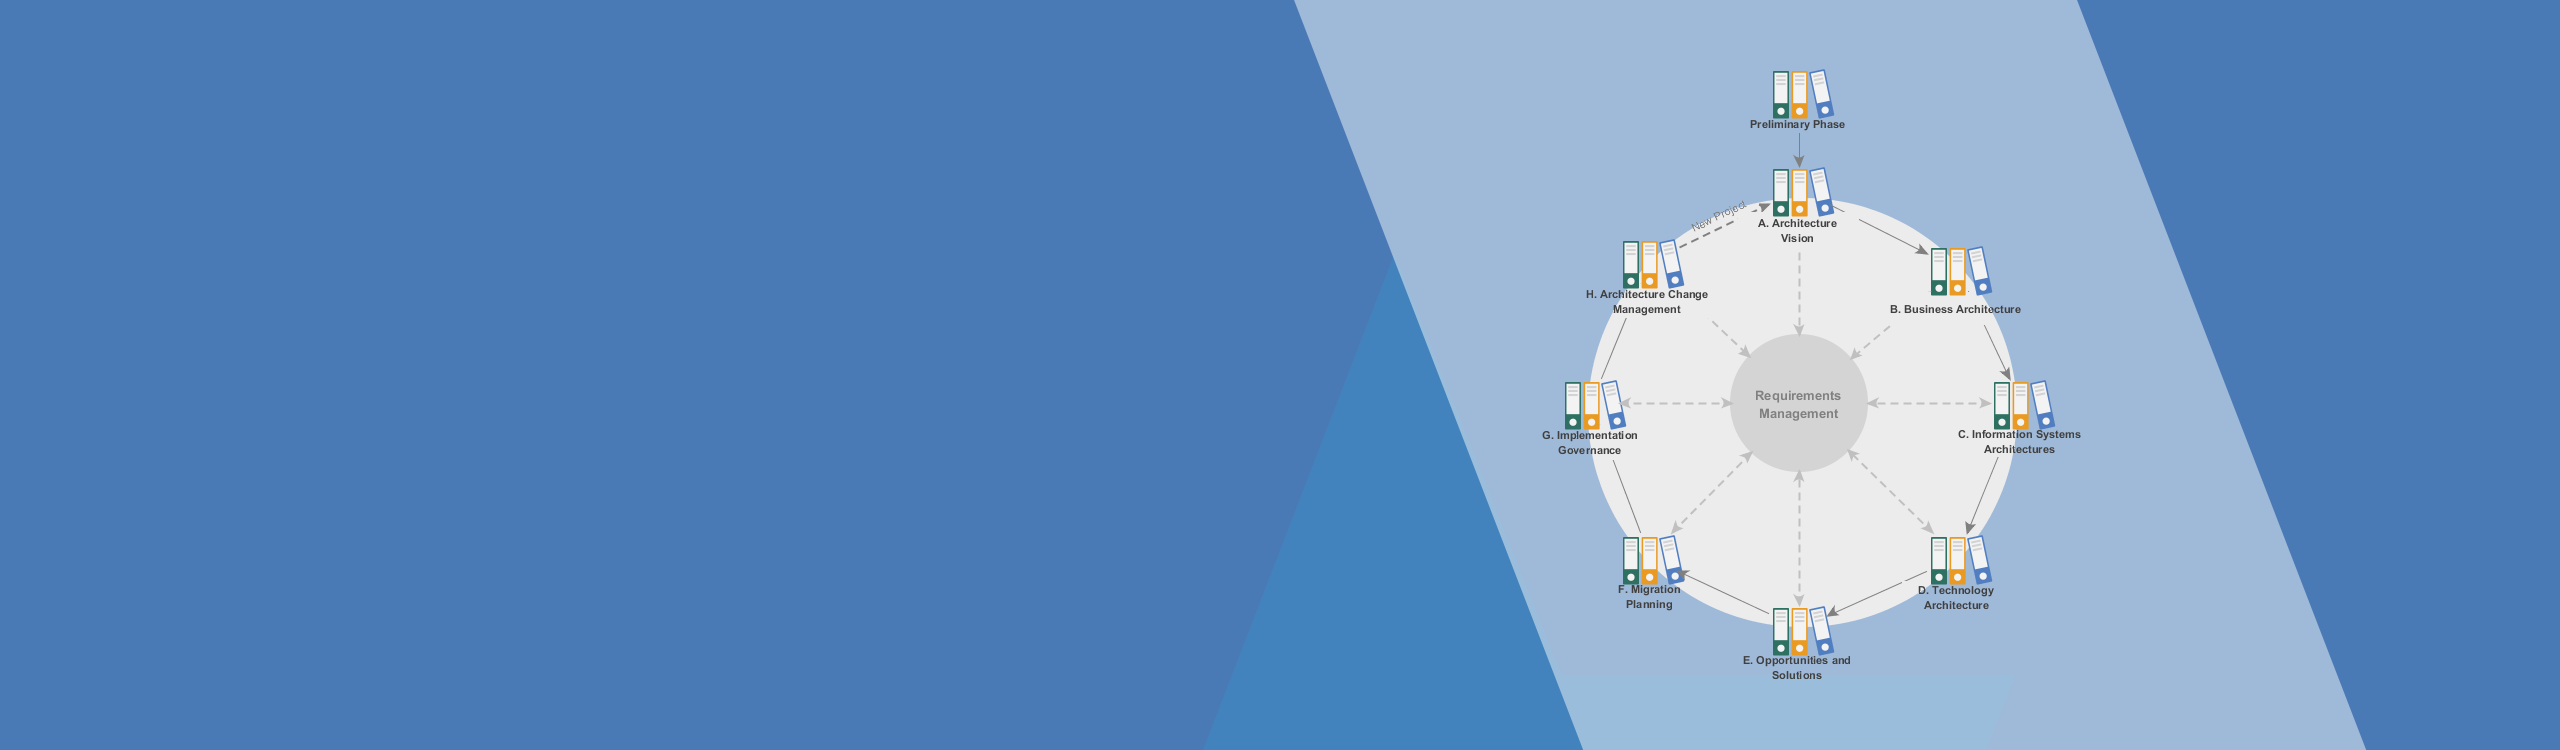 TOGAF<sup>&reg;</sup> Process Navigator